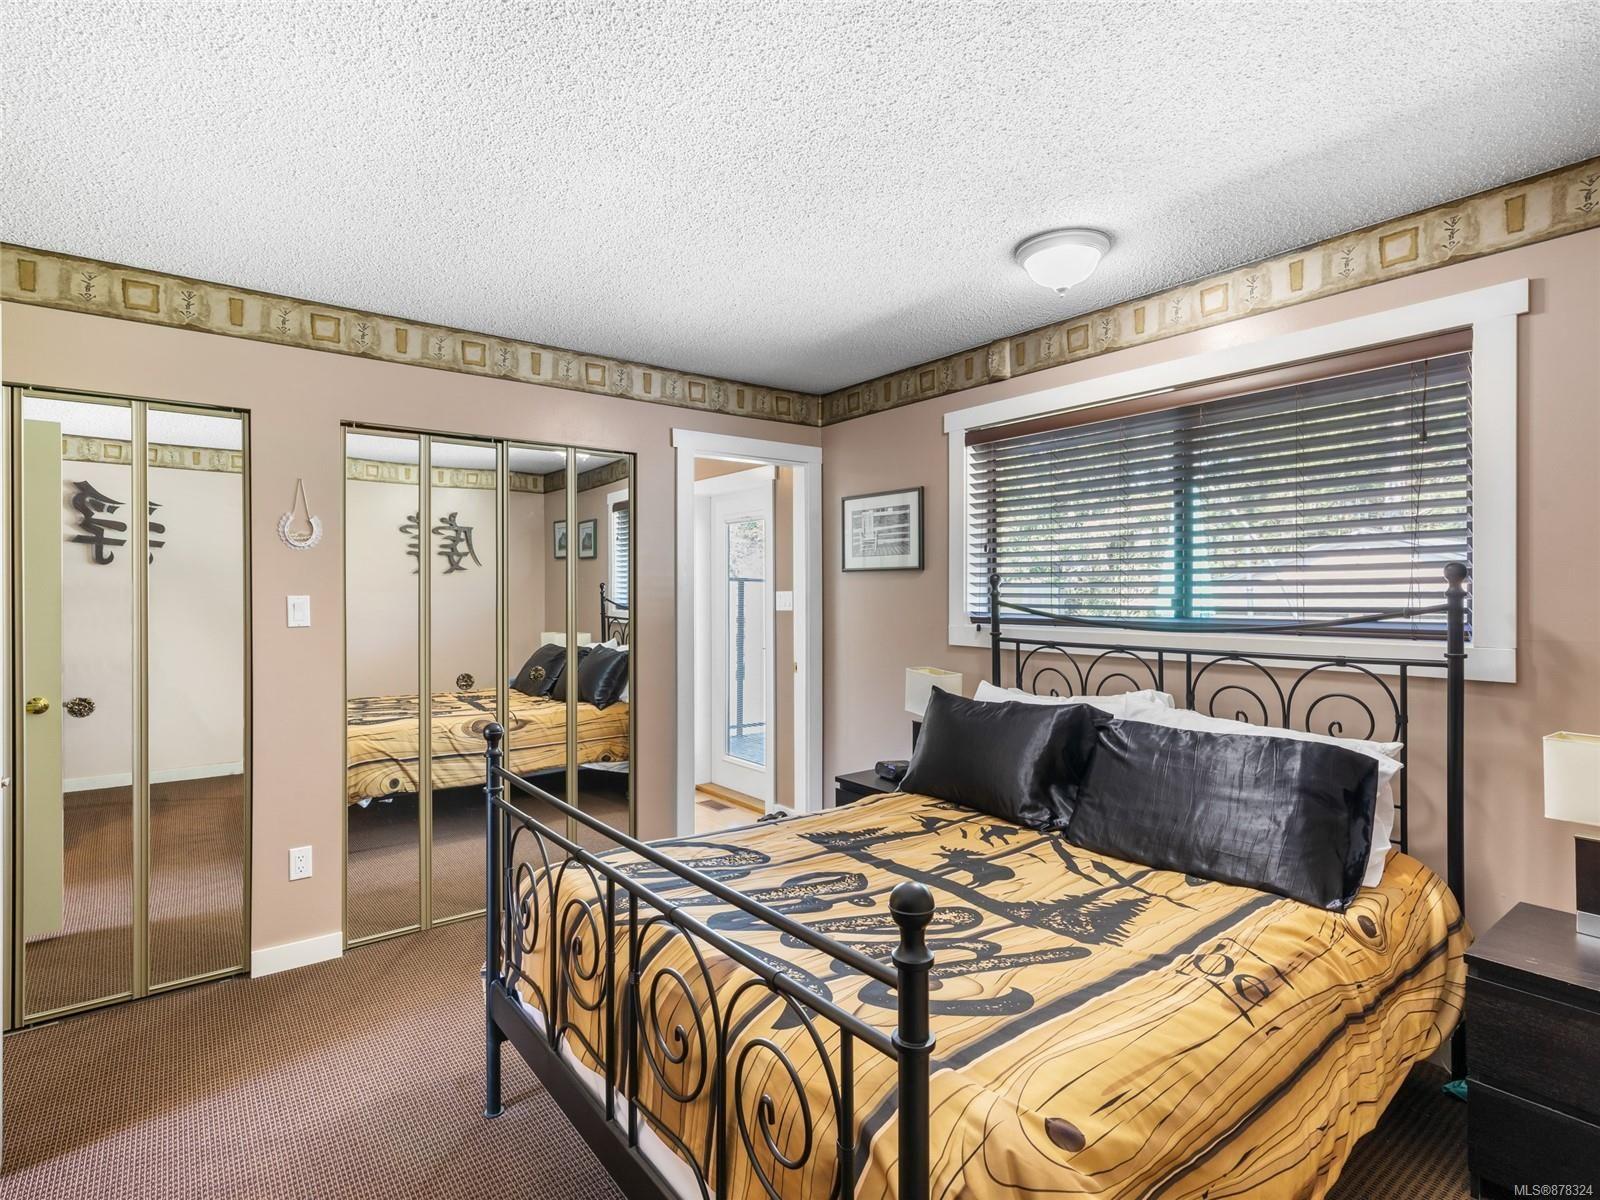 Photo 34: Photos: 3875 Moore Rd in : PA Port Alberni House for sale (Port Alberni)  : MLS®# 878324